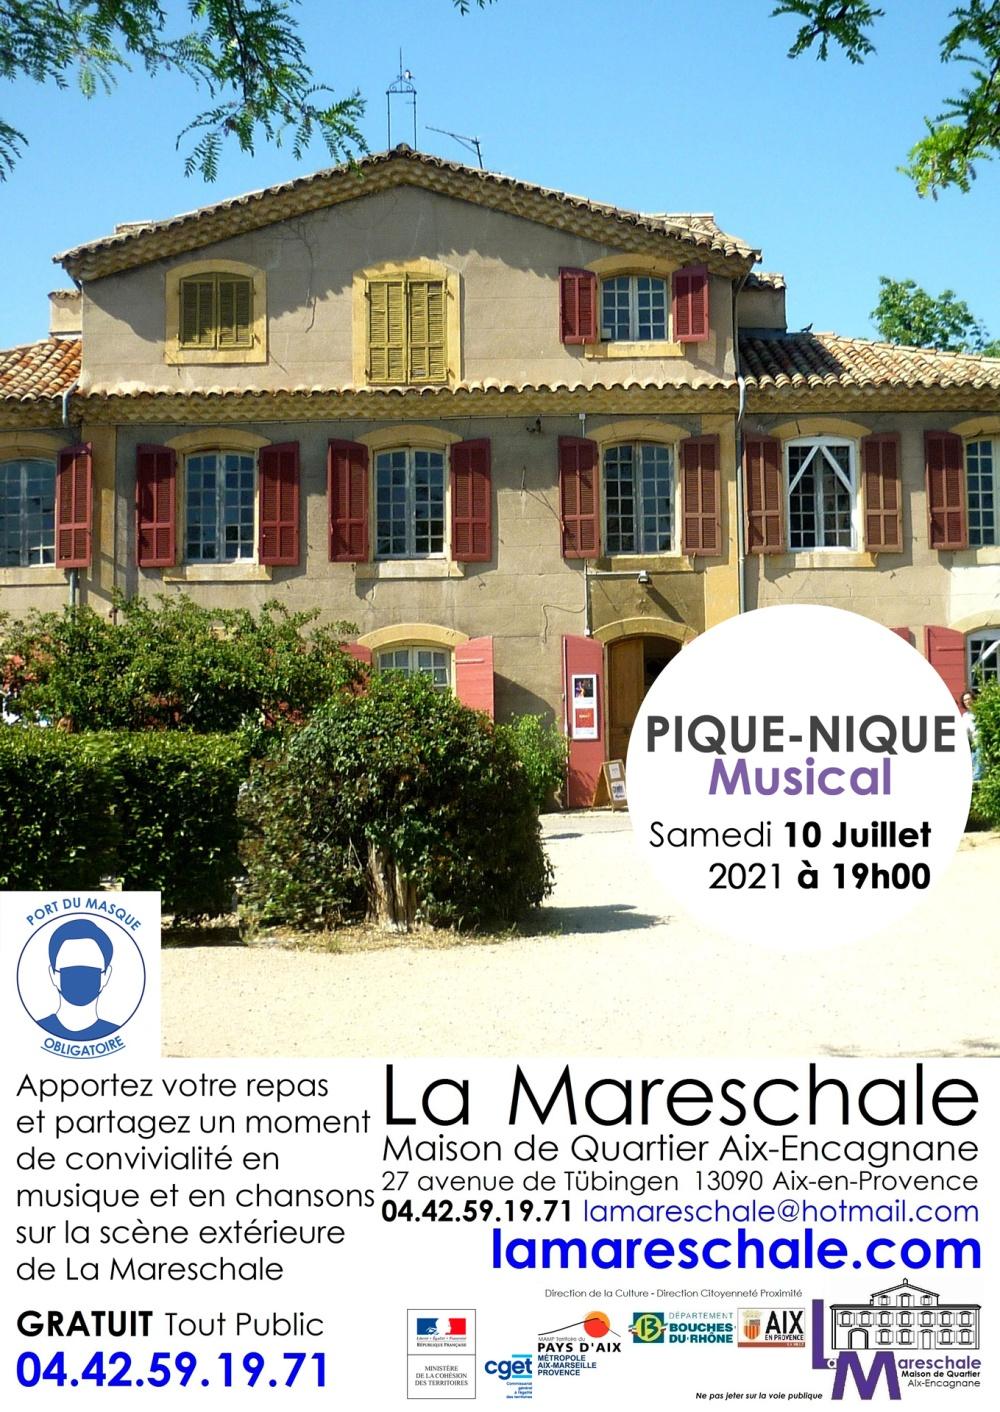 pique-nique-musical-10juillet2021-report